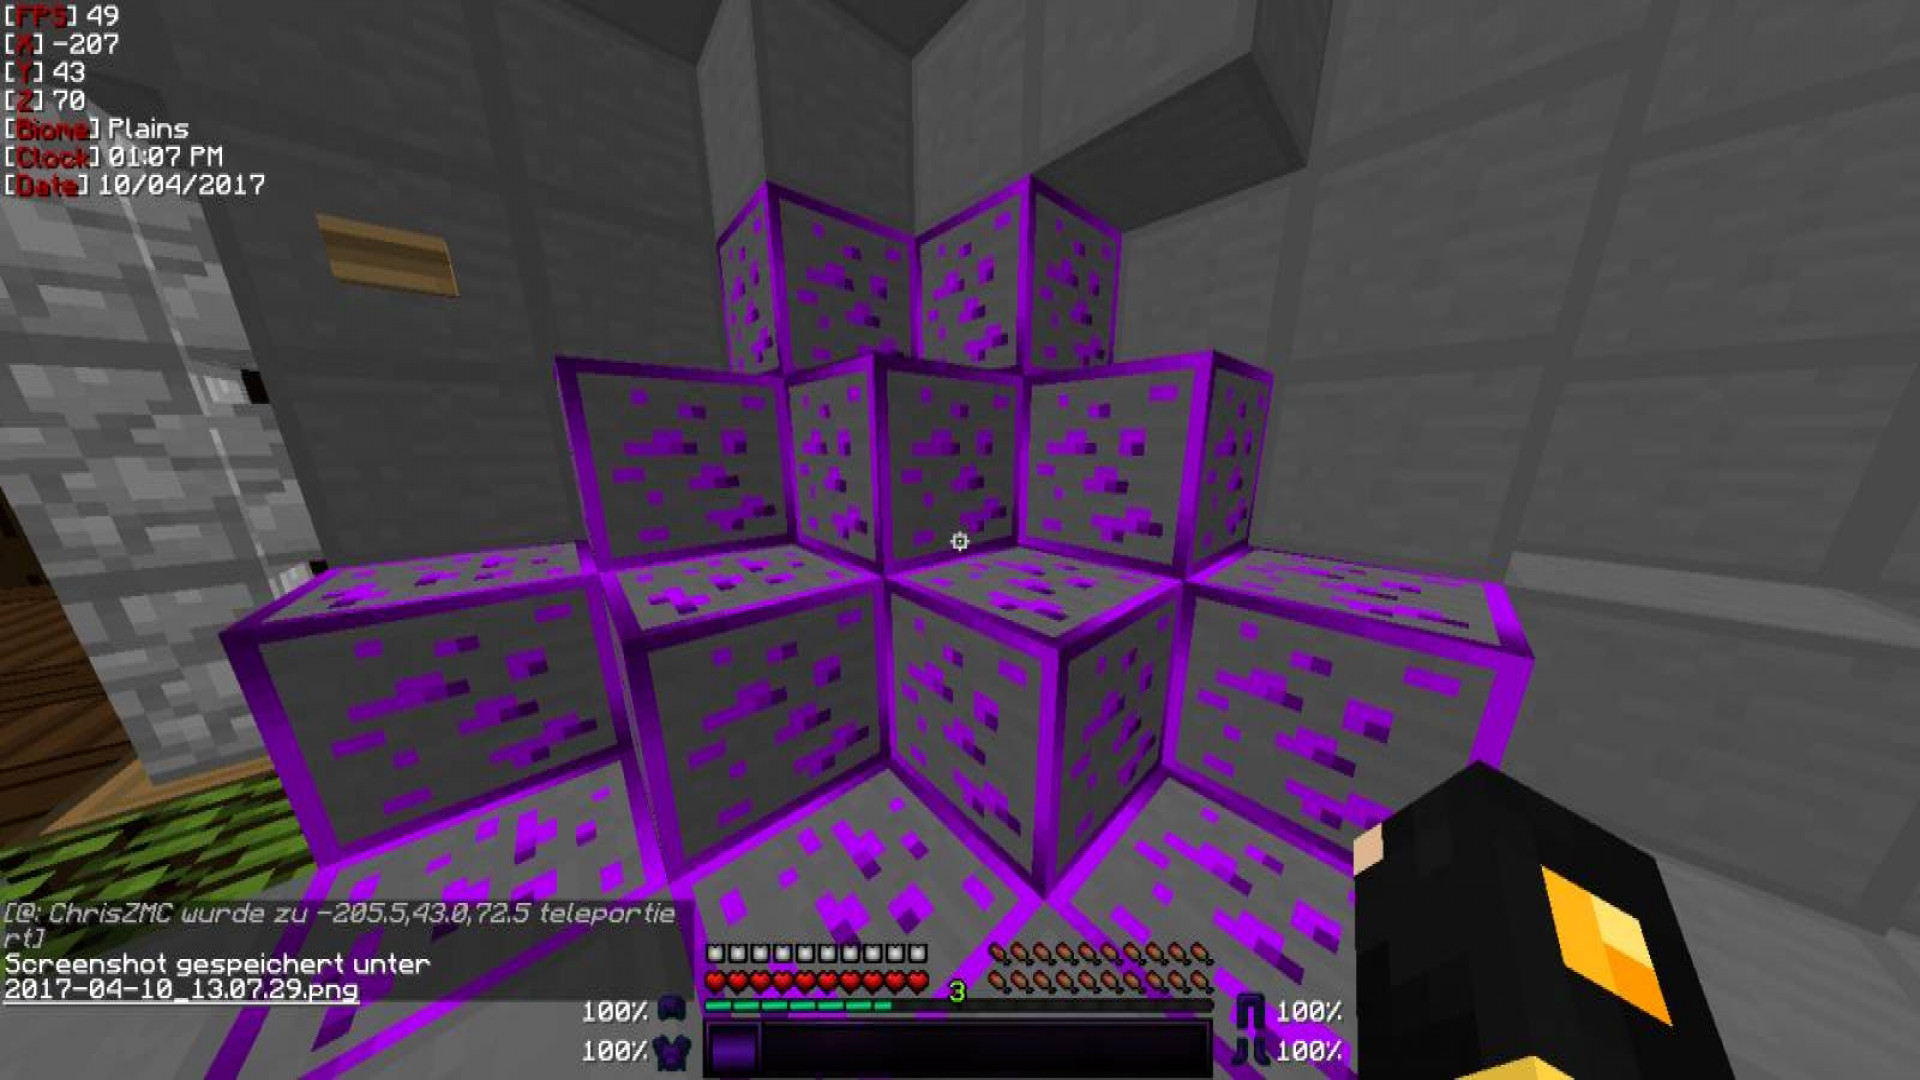 ShantvFinale128x - Violett edit